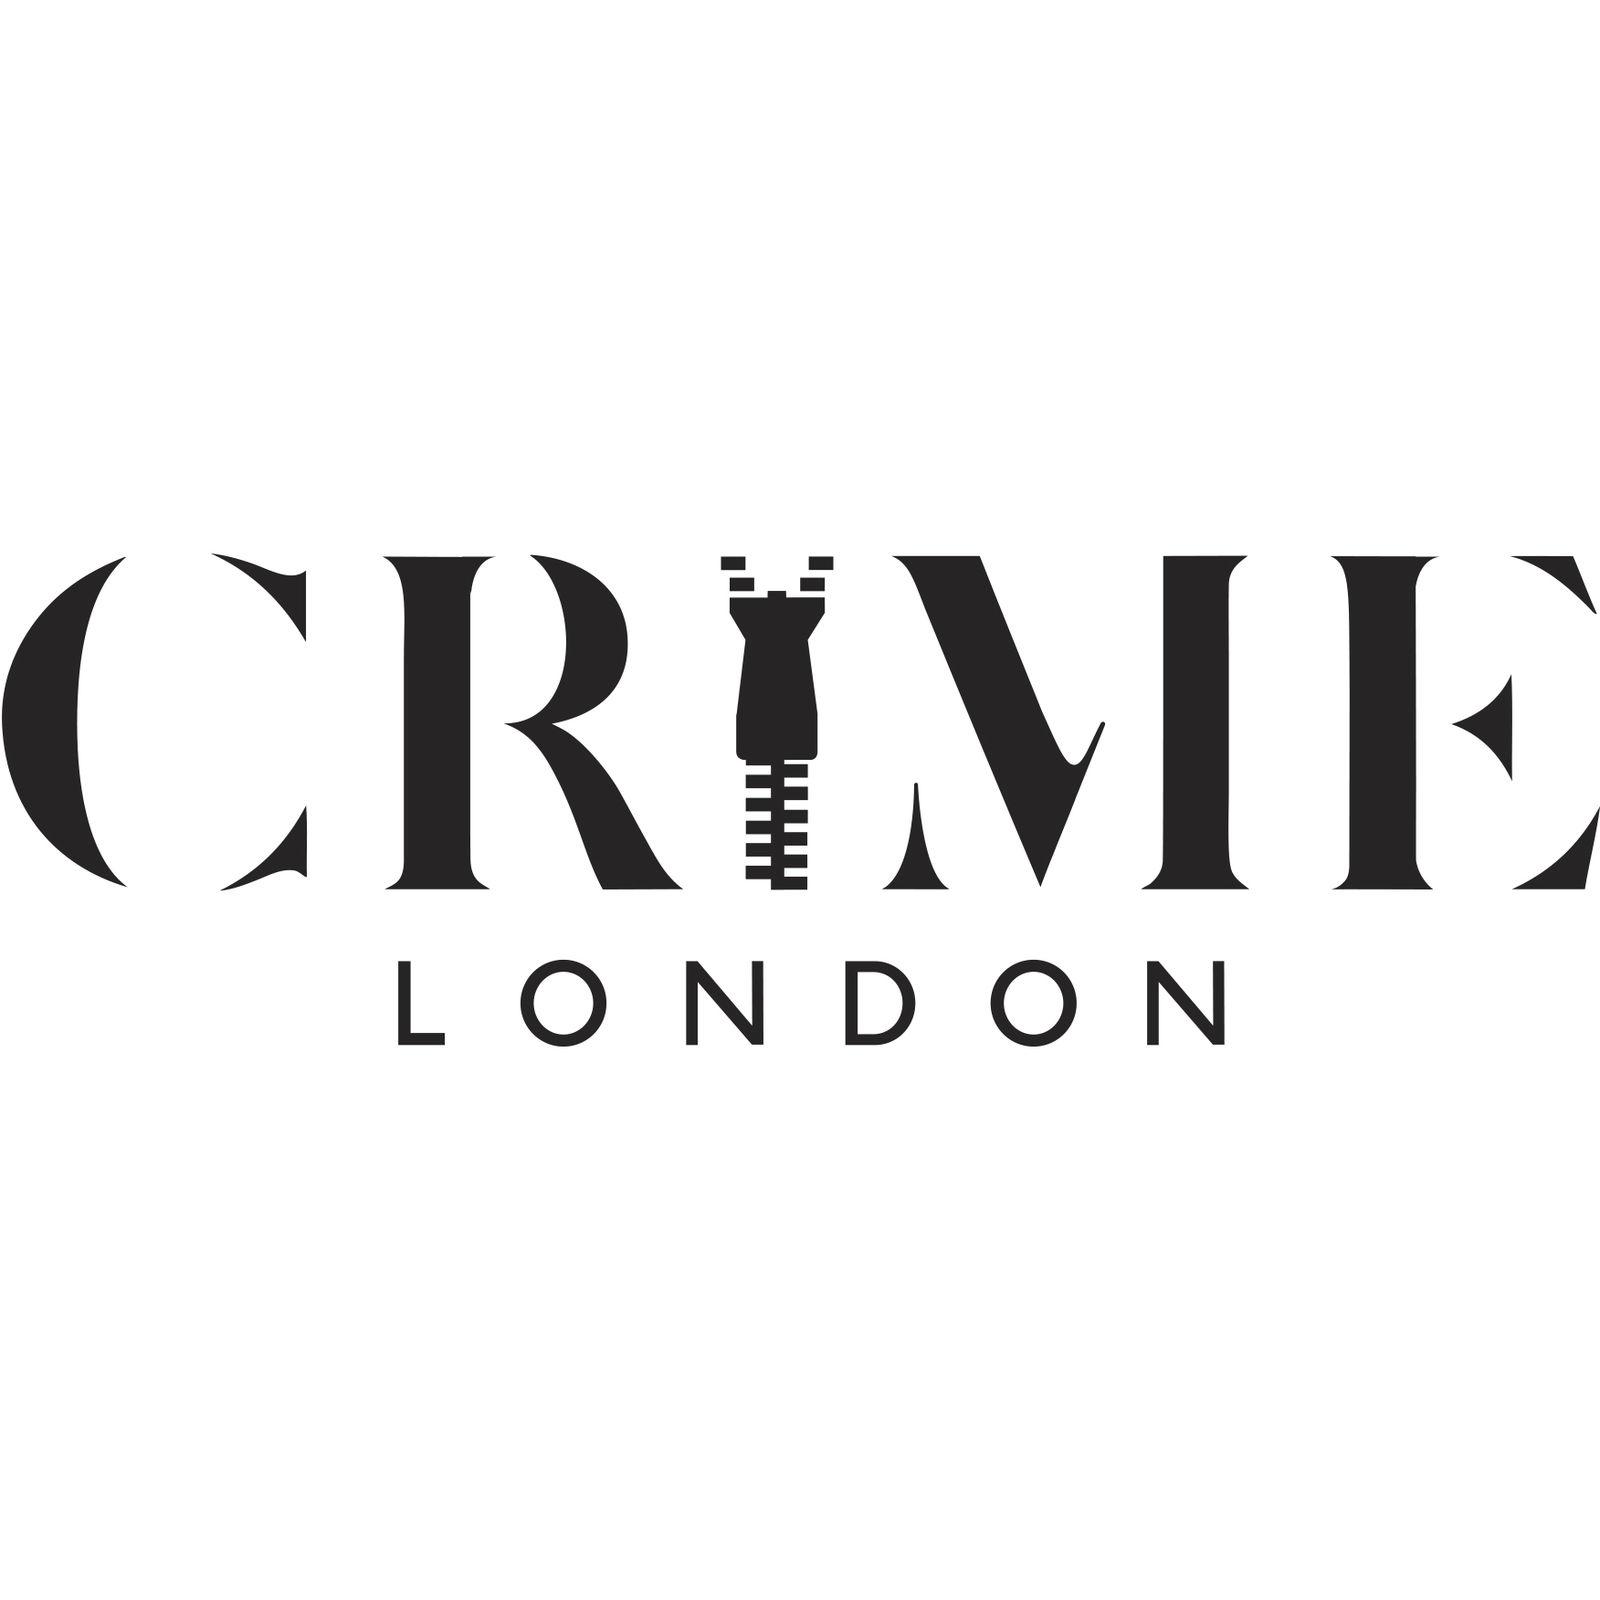 CRIME LONDON